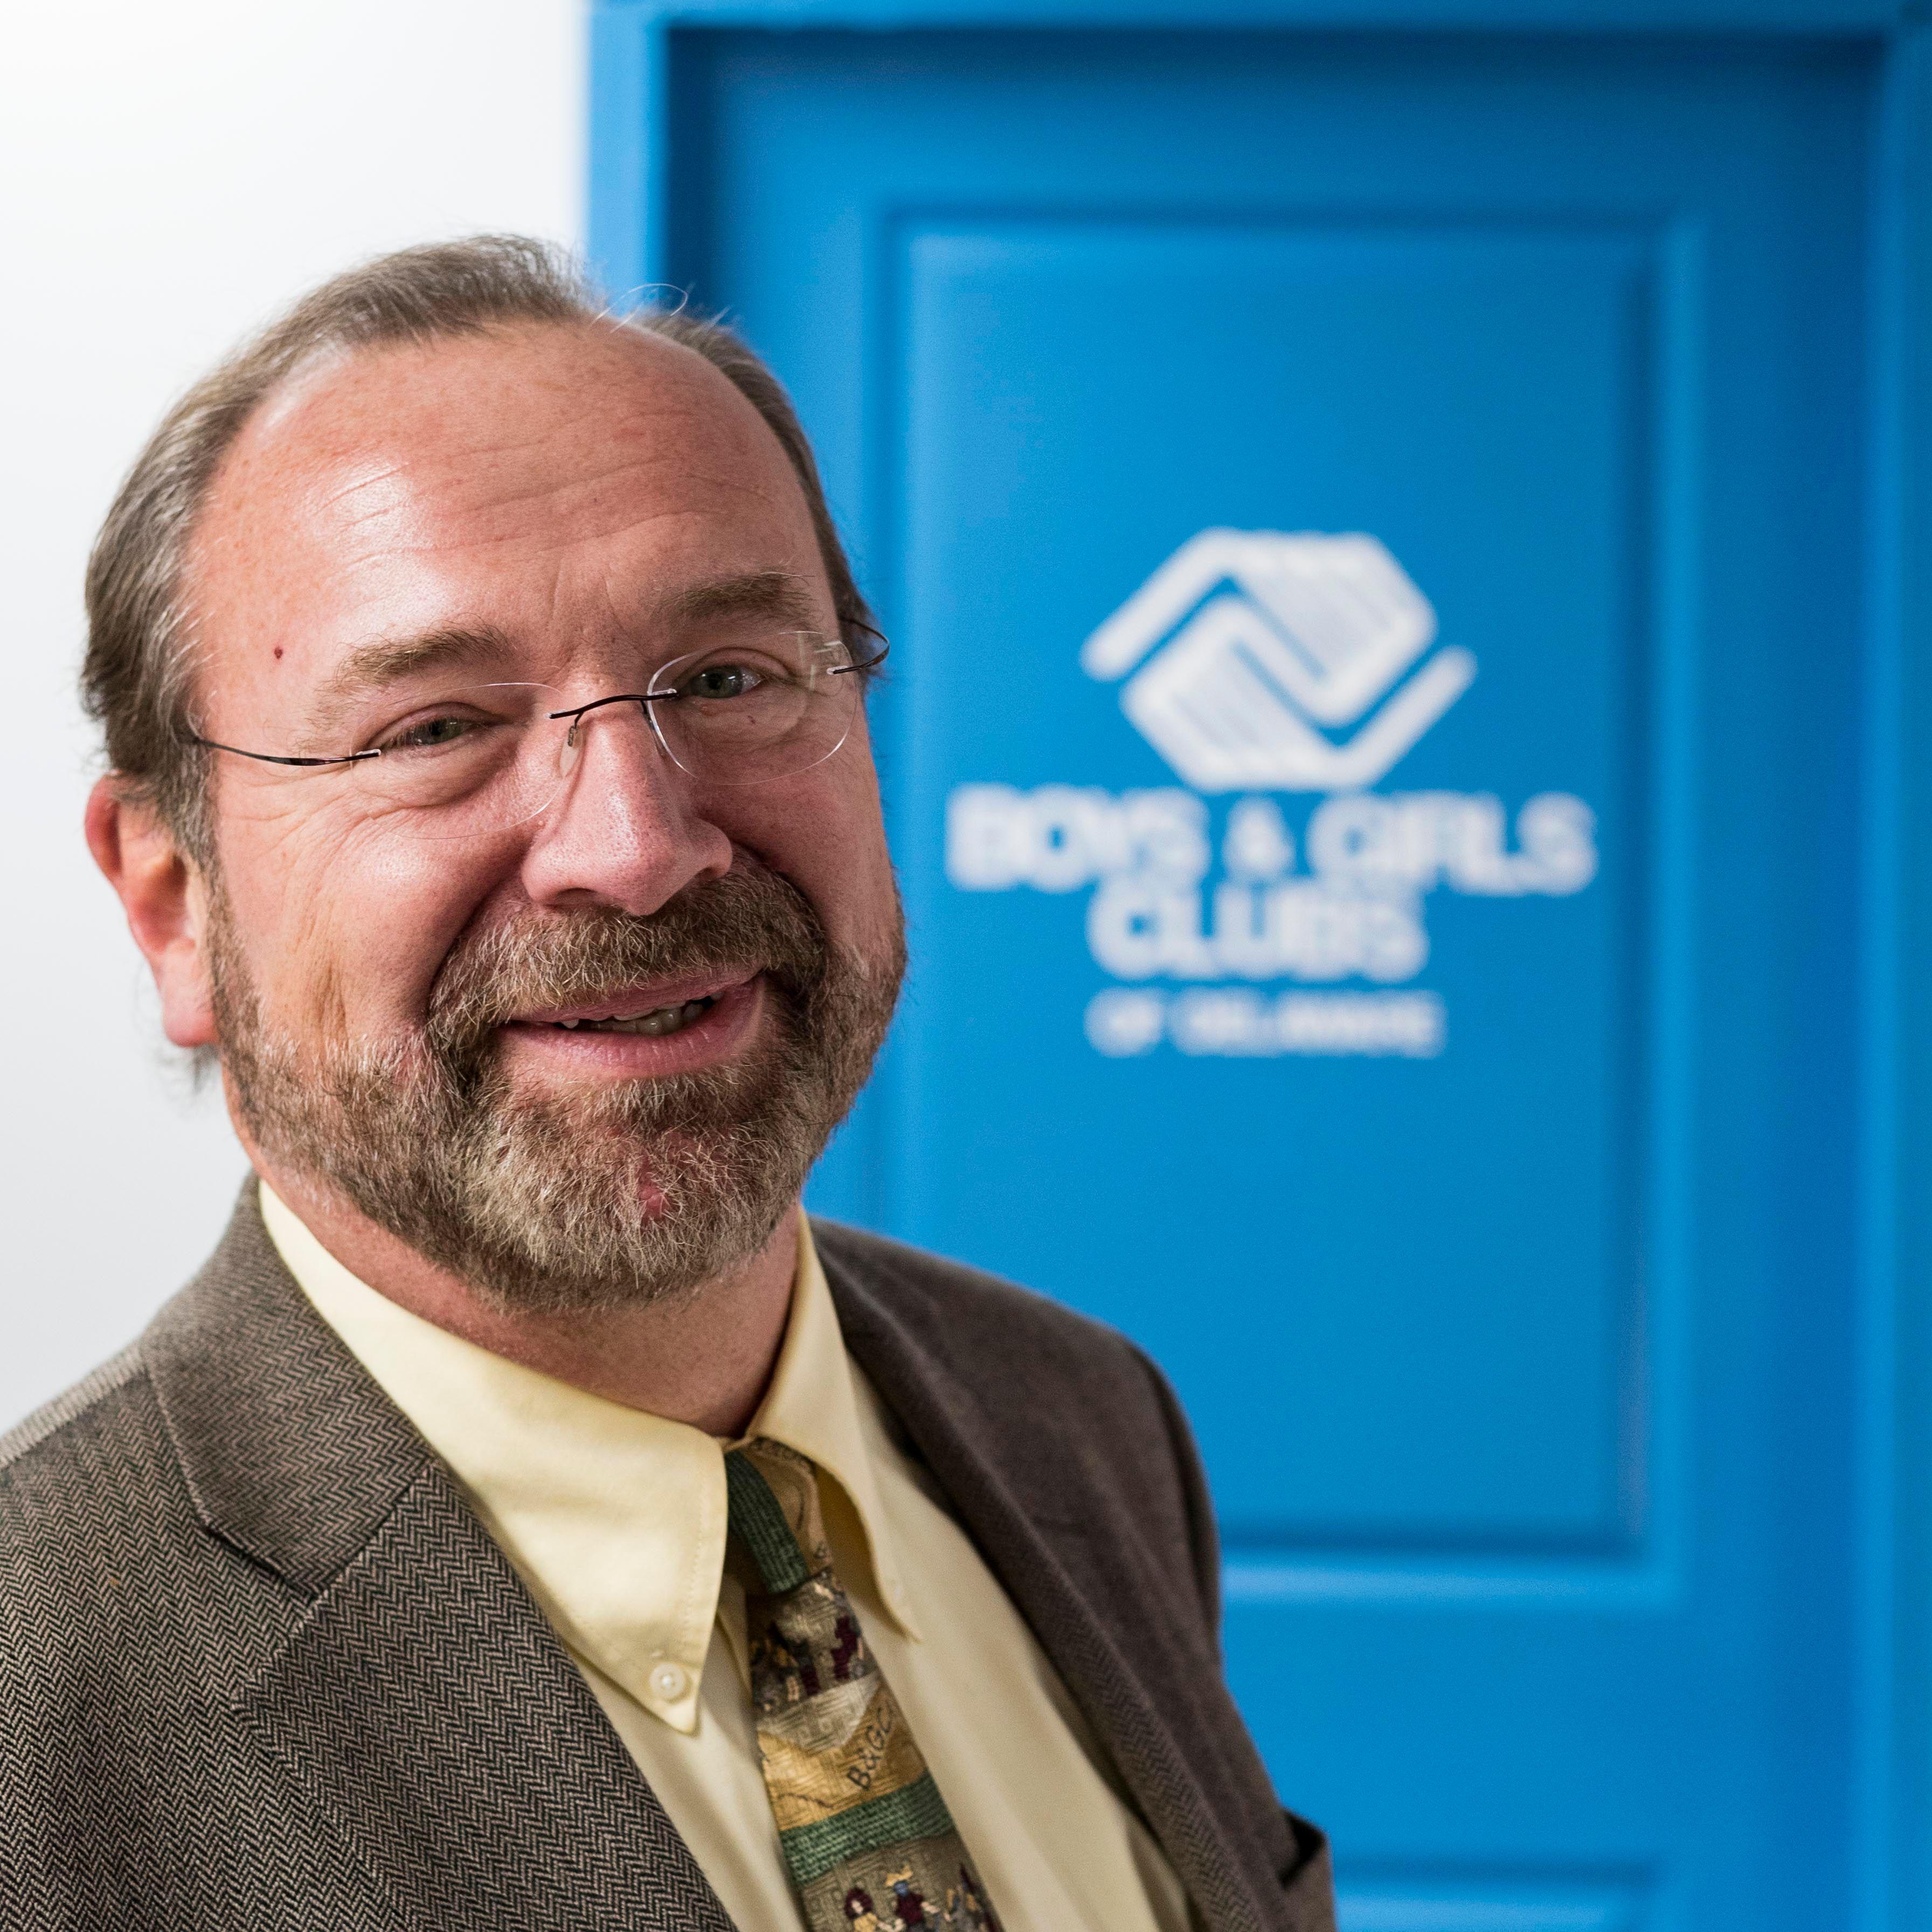 George Krupanski